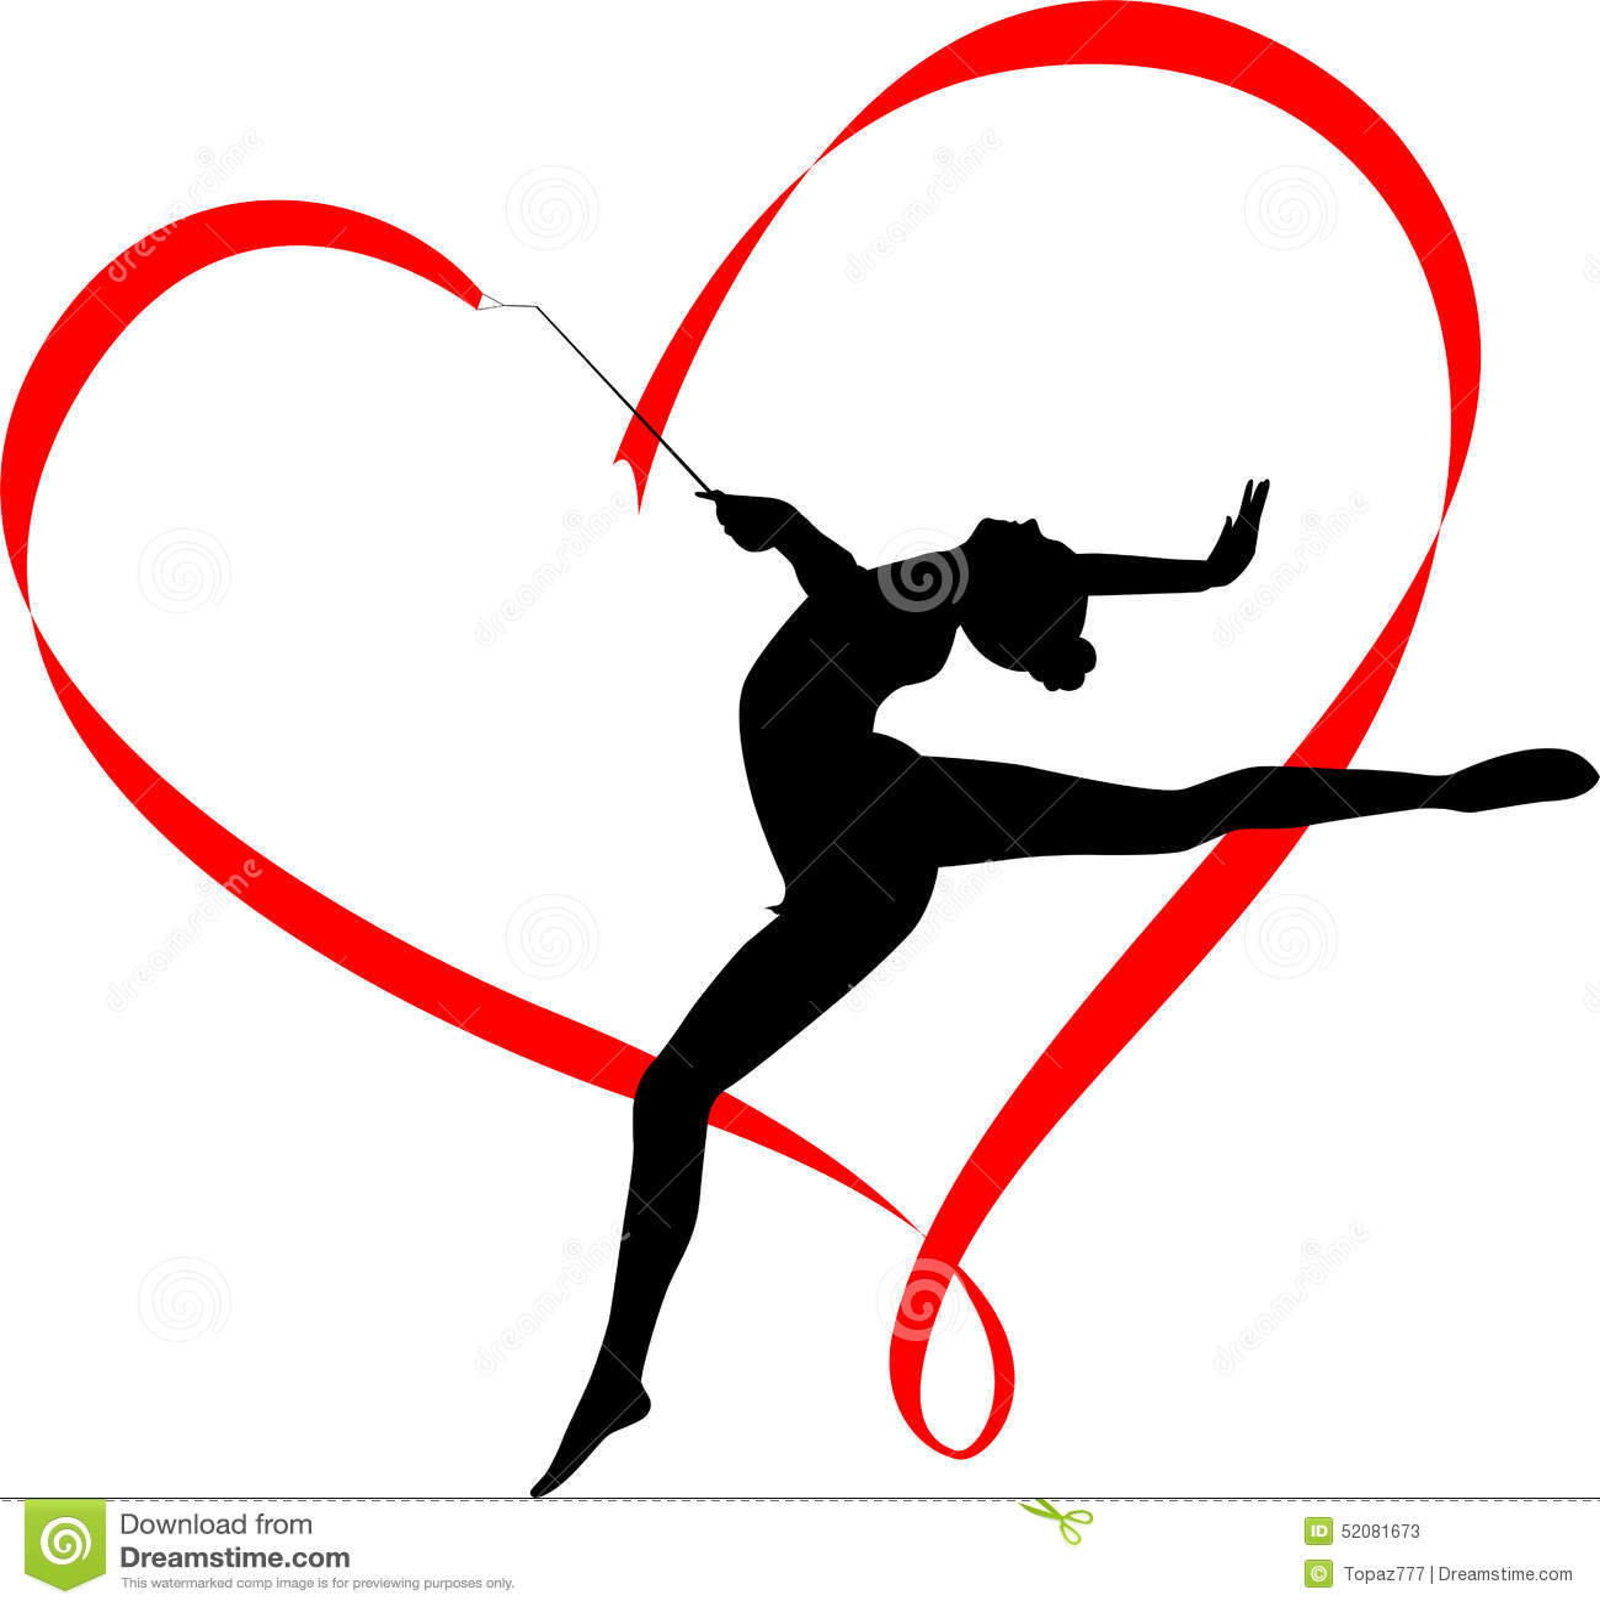 Gymnastics Logo Gymnast Athlete Athletics Vector Heart Ribbon Rhythm Illustrations Royalty Free